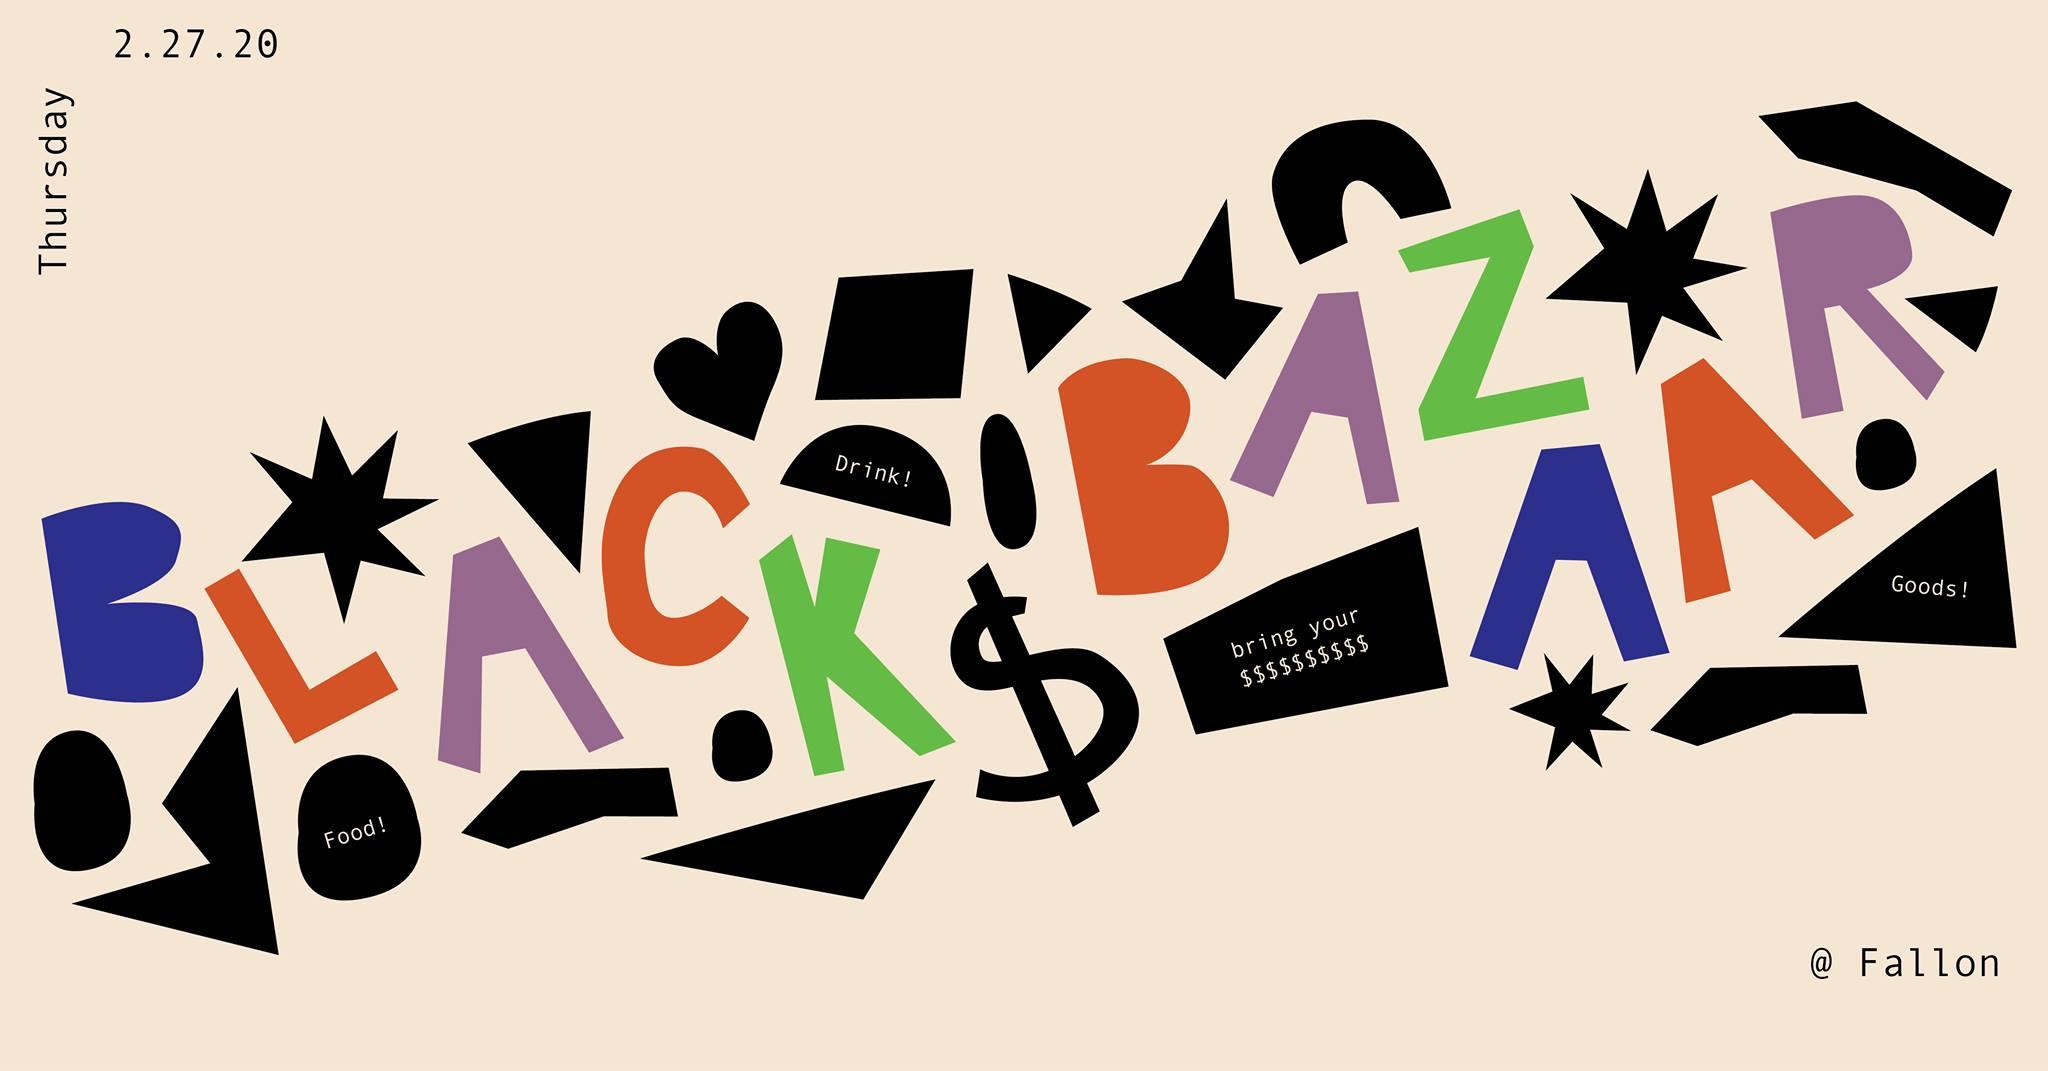 Minneapolis Halloween Half Marathon 2020, Father Hennepin Bluff Park, October 27 February 27, 2020, Thursday   Black Bazaar: A Pop Up Event to